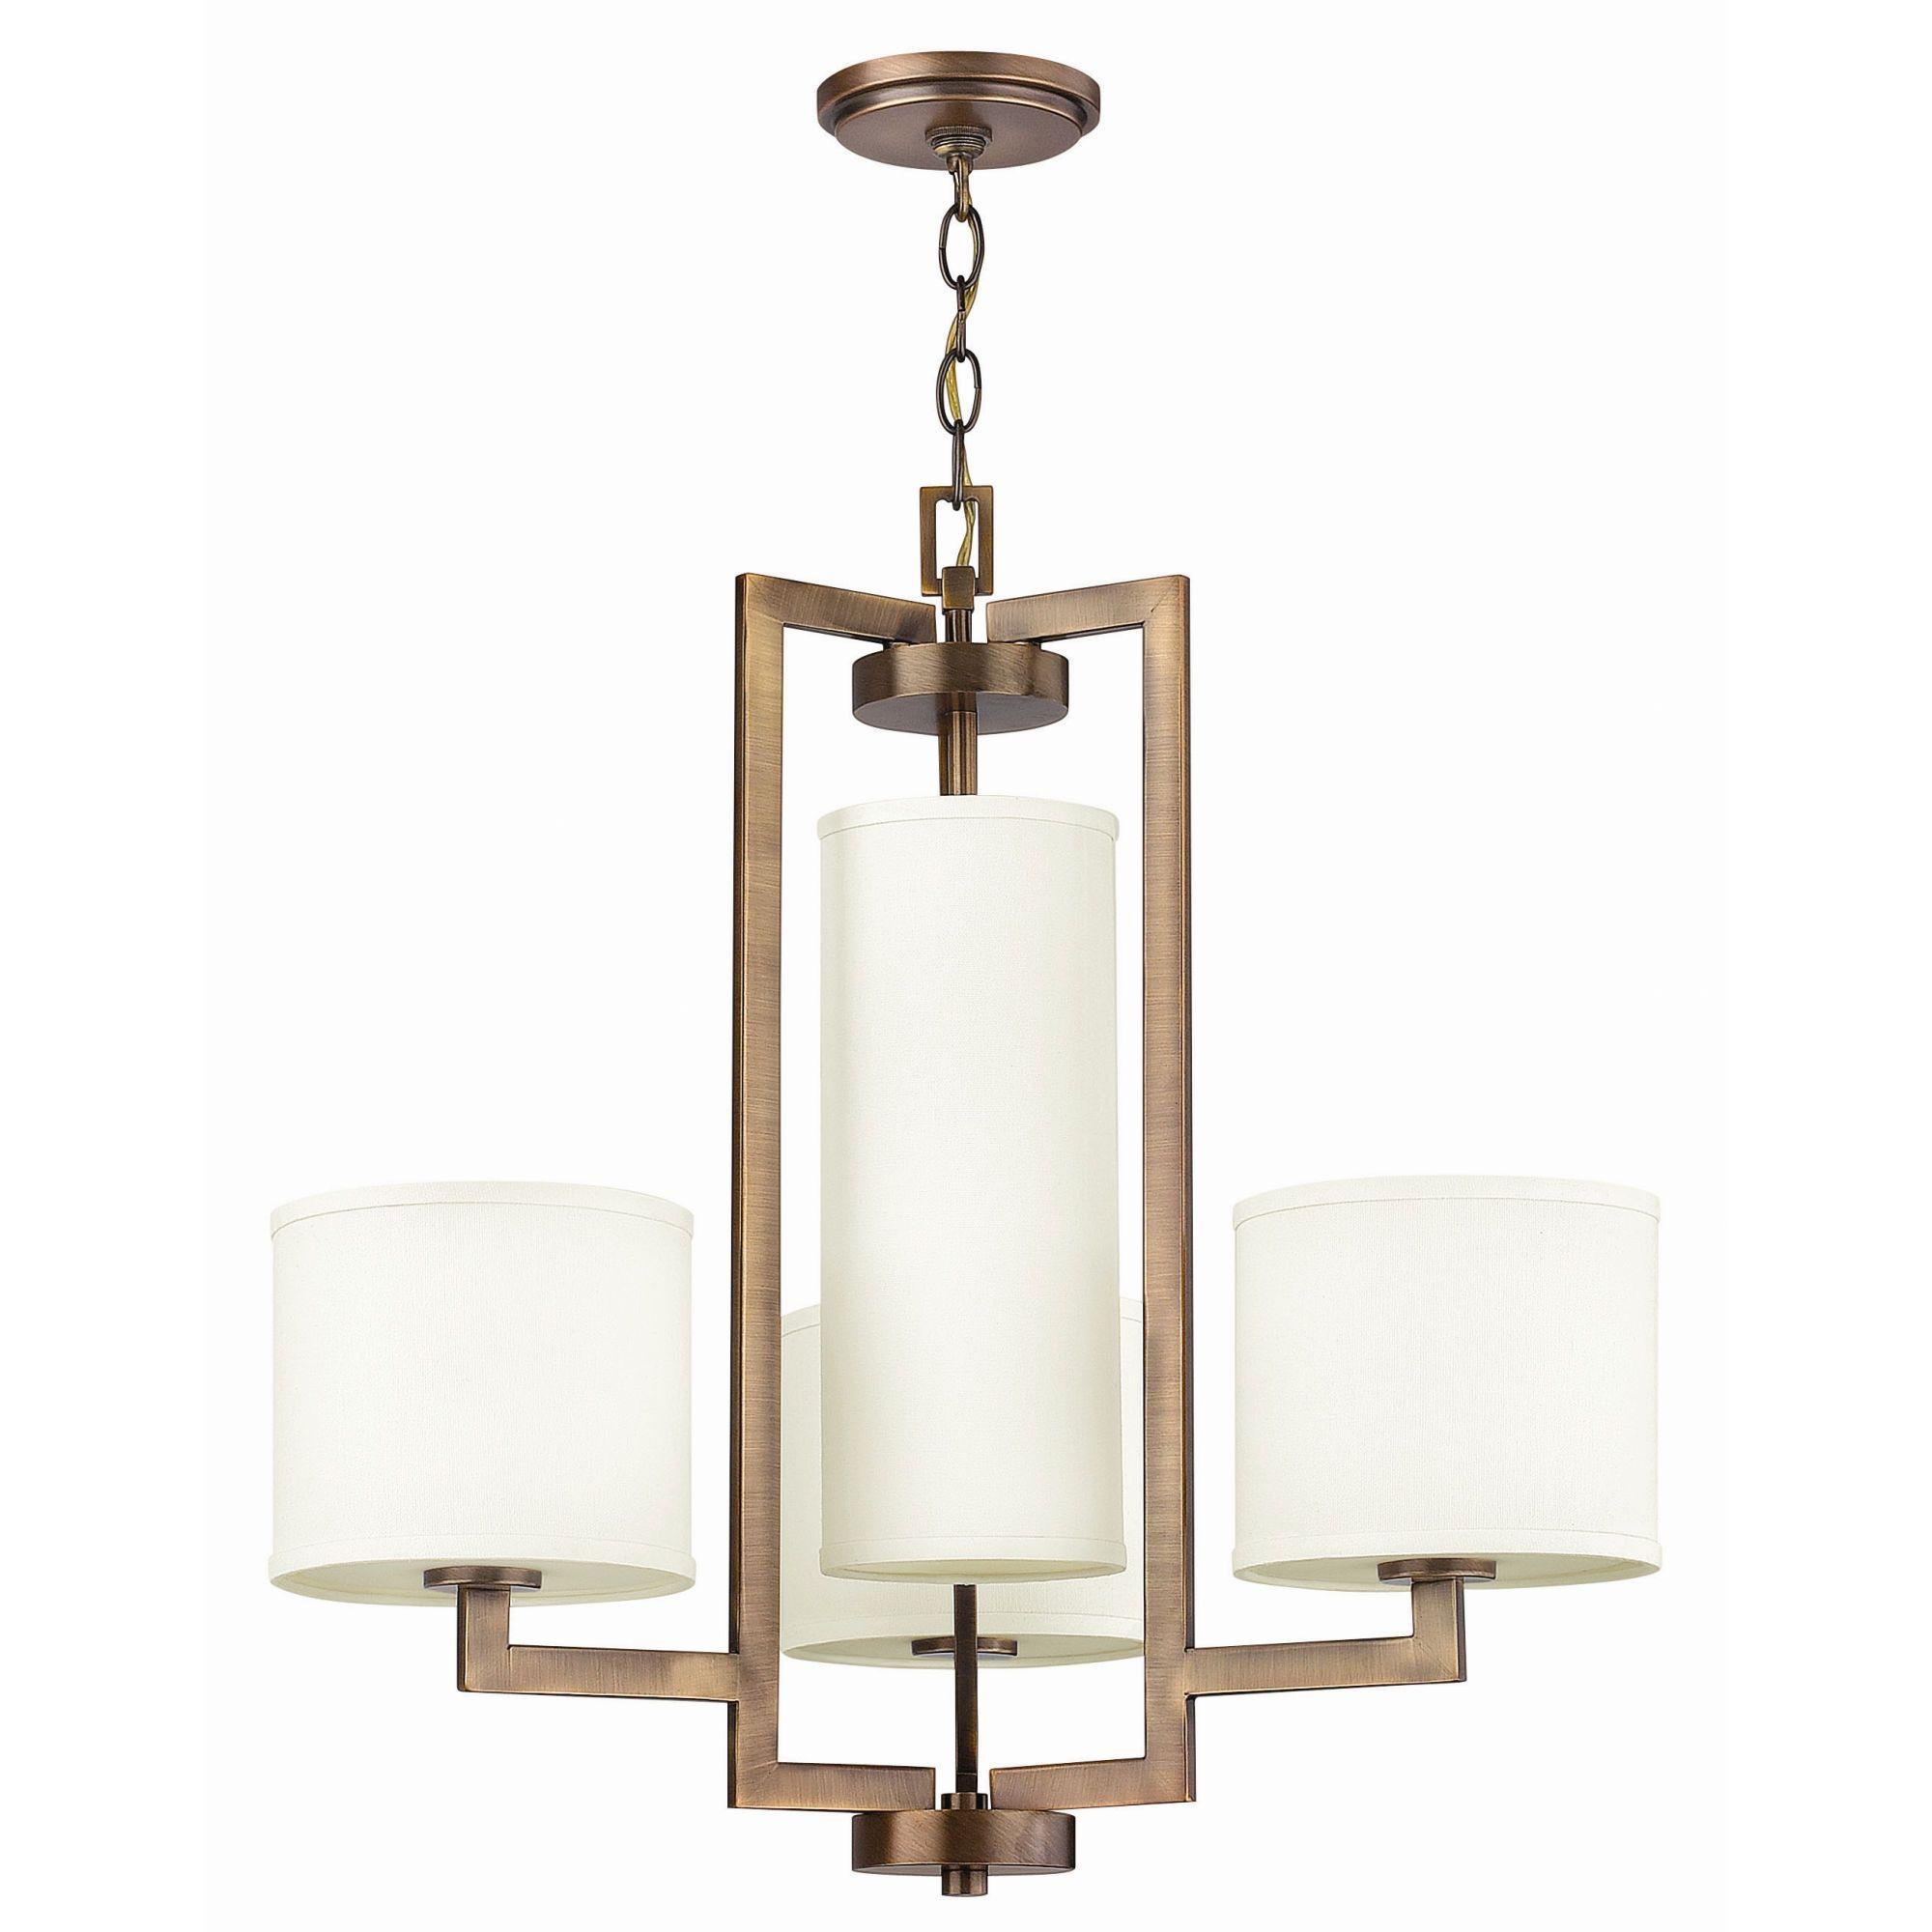 Hinkley hampton lighting for the home pinterest chandeliers